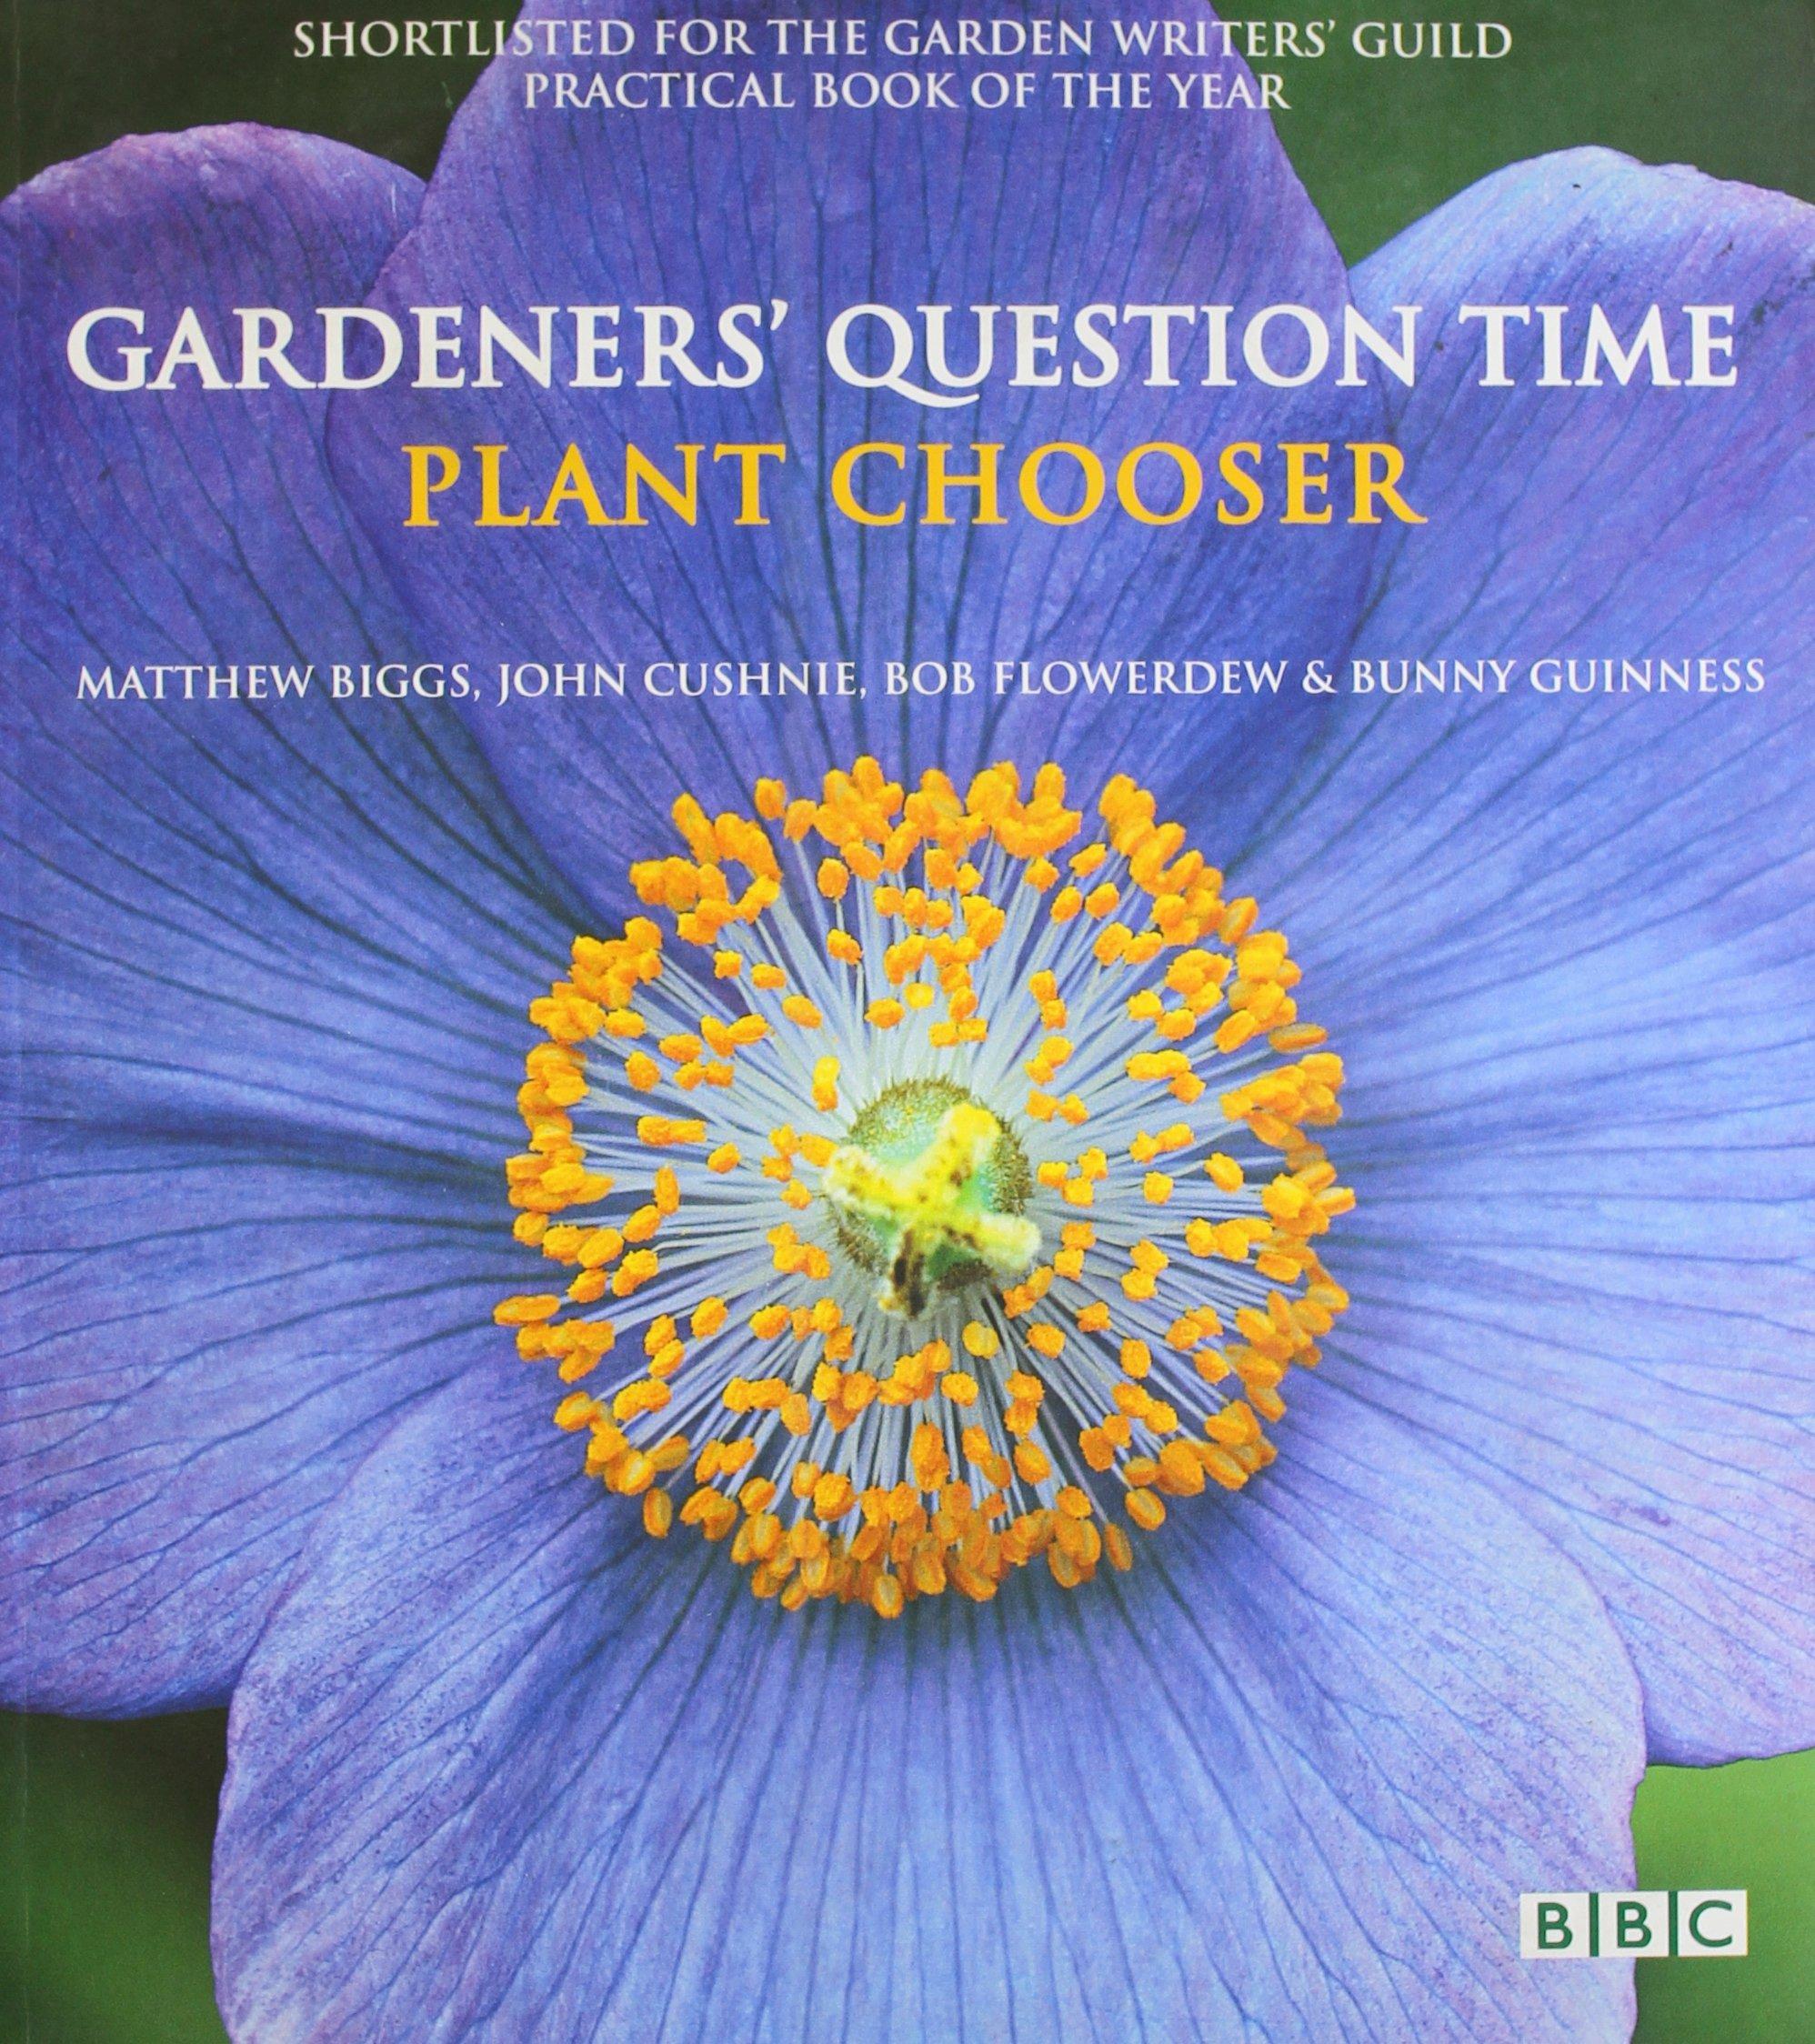 gardener-s-question-time-plant-chooser